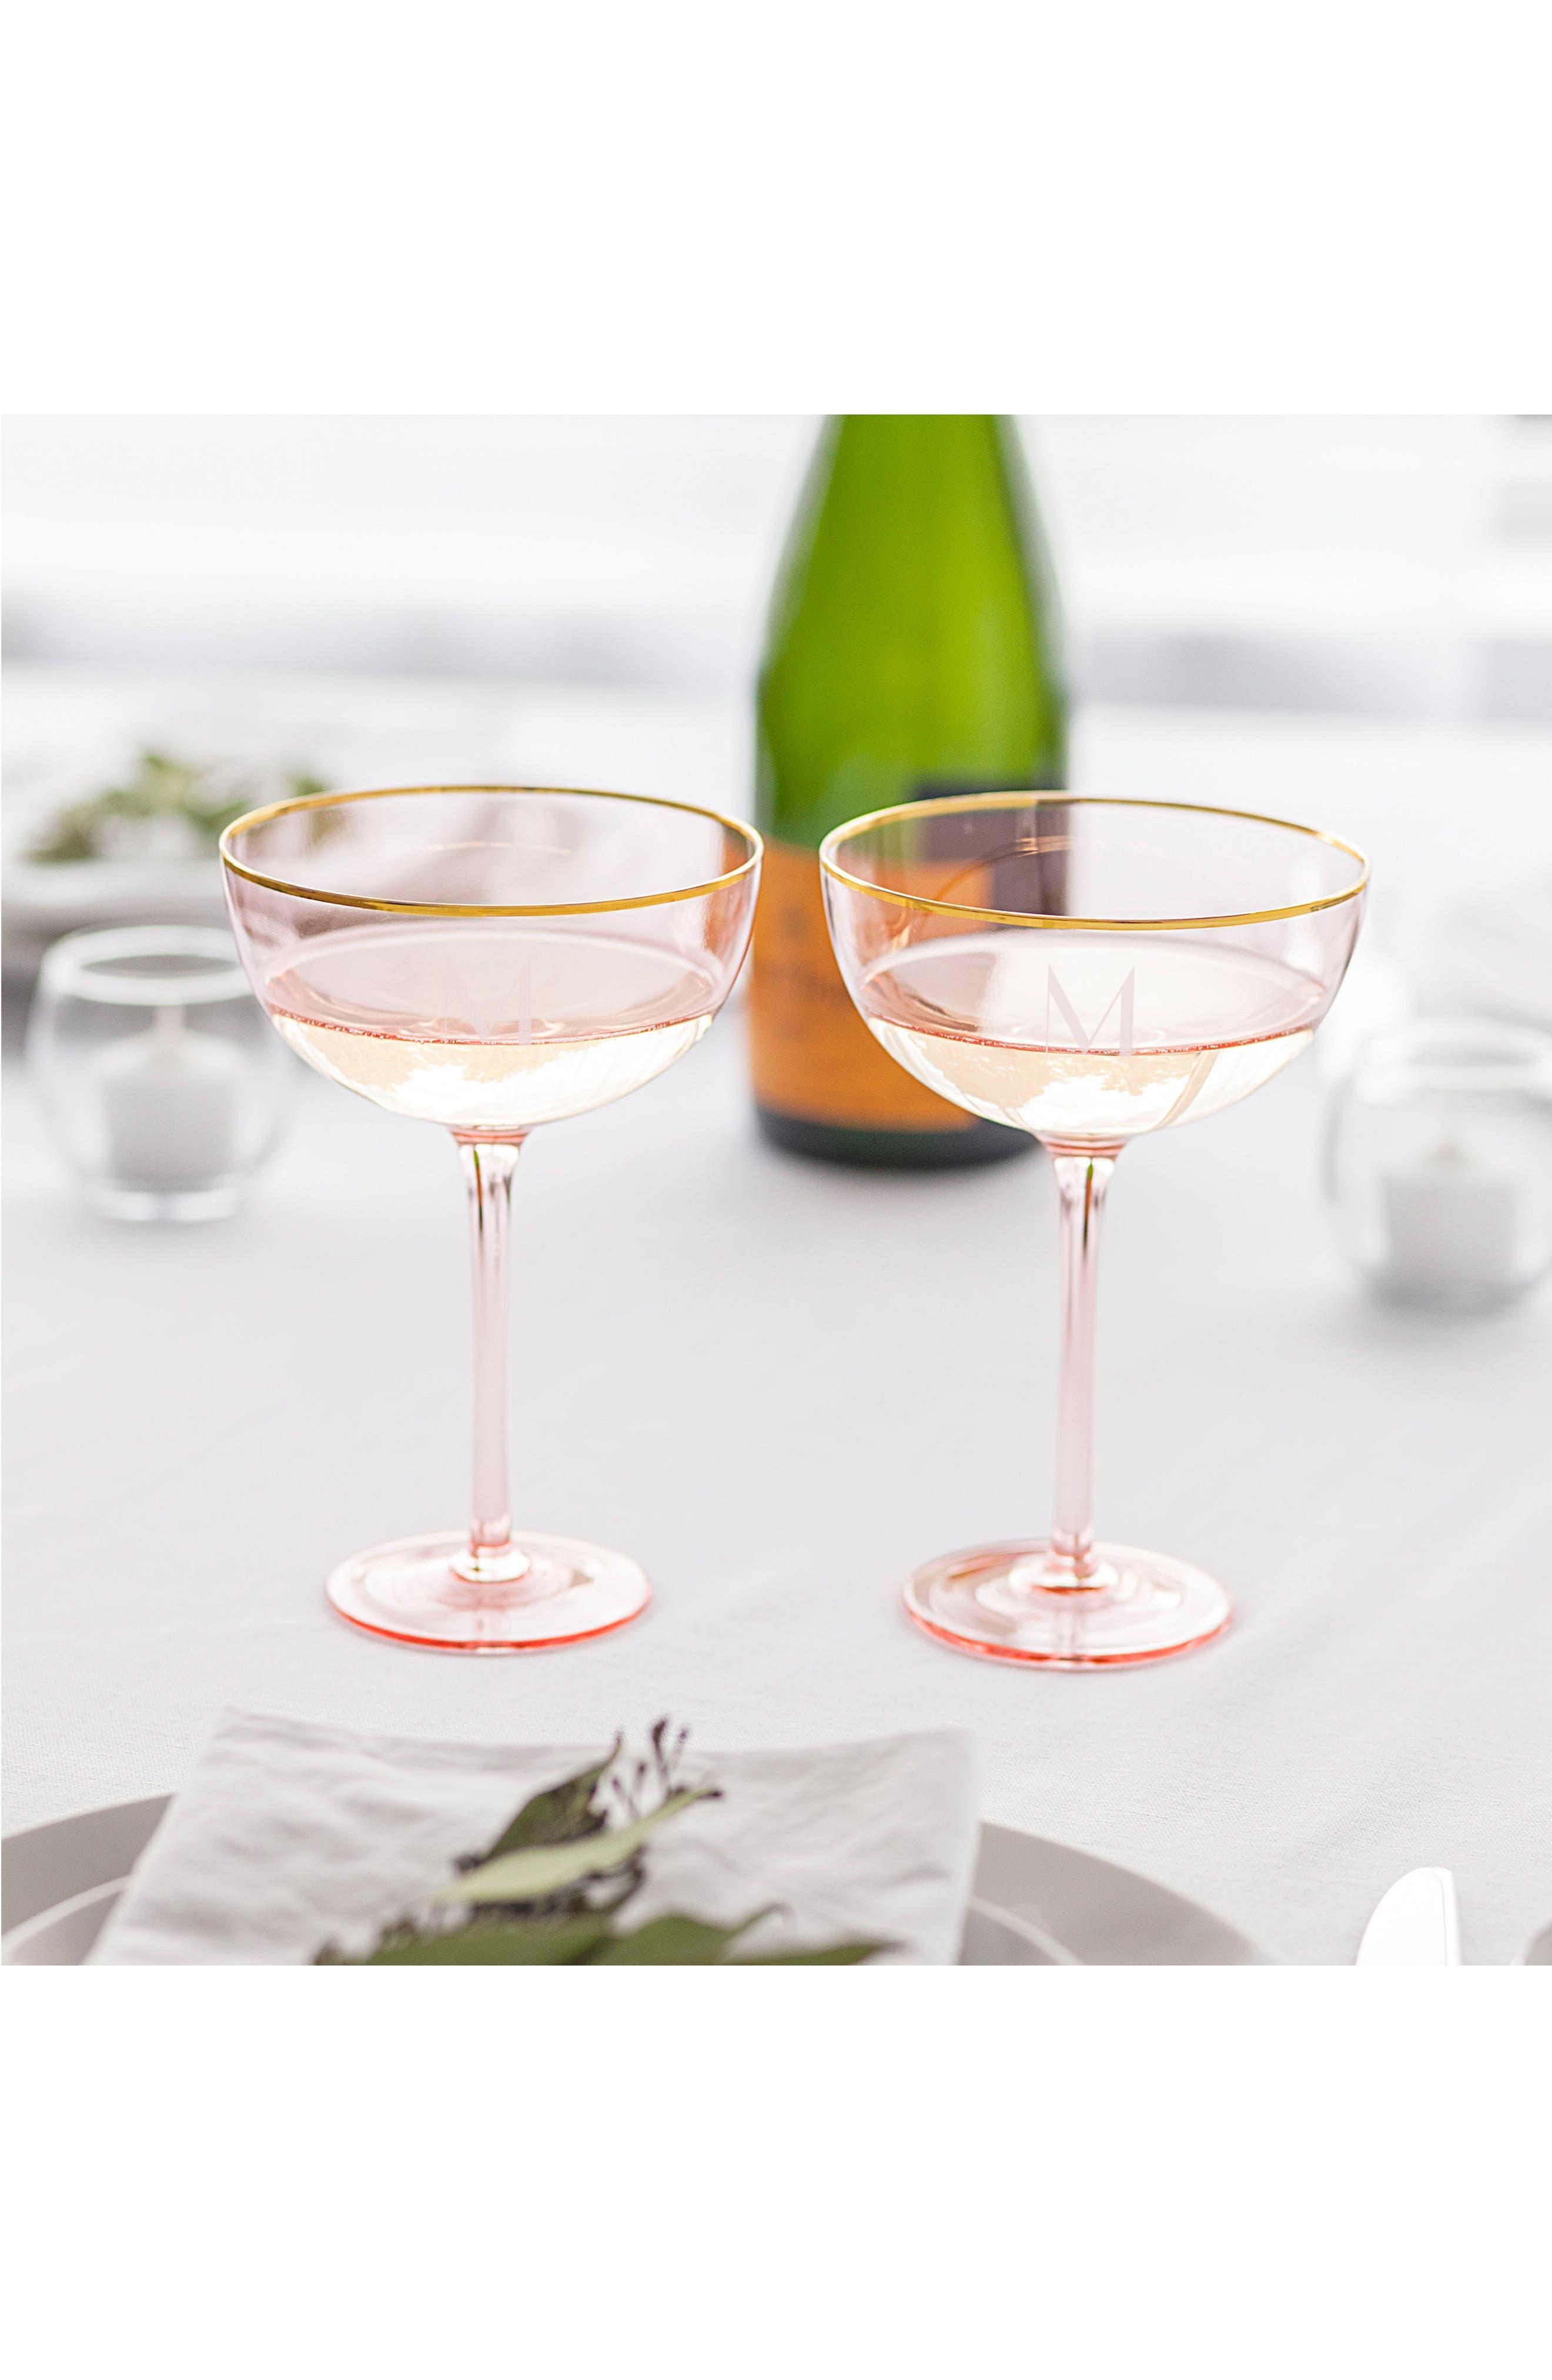 Monogram Set of 2 Champagne Coupes,                             Alternate thumbnail 6, color,                             Blush